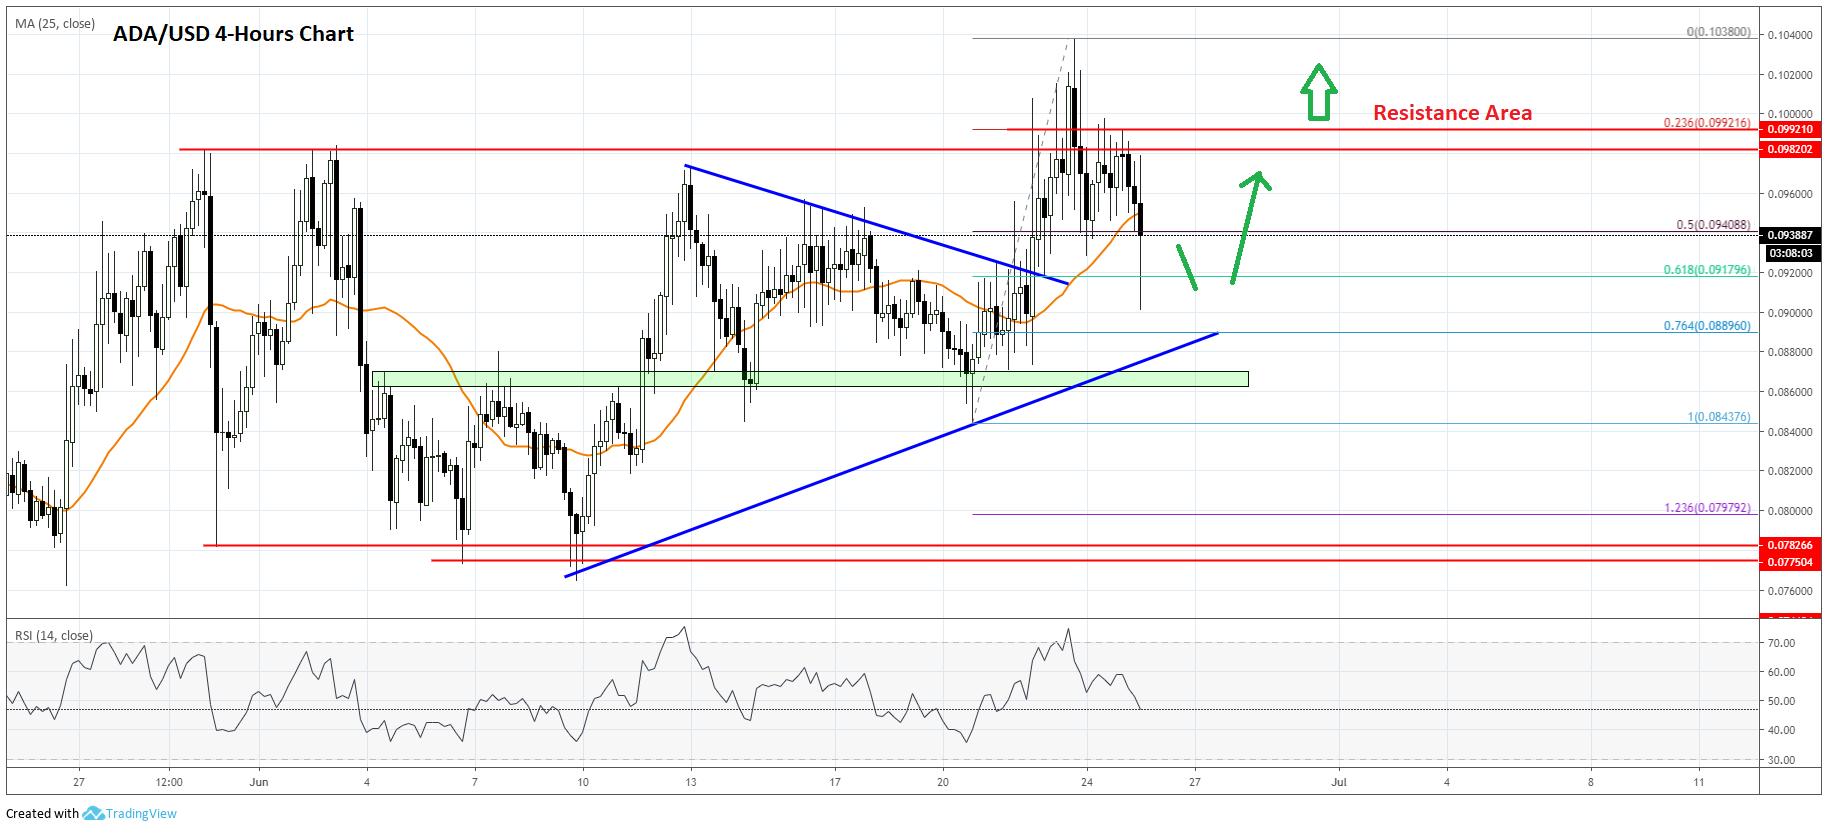 Cardano Price Analysis (ADA to USD) Chart